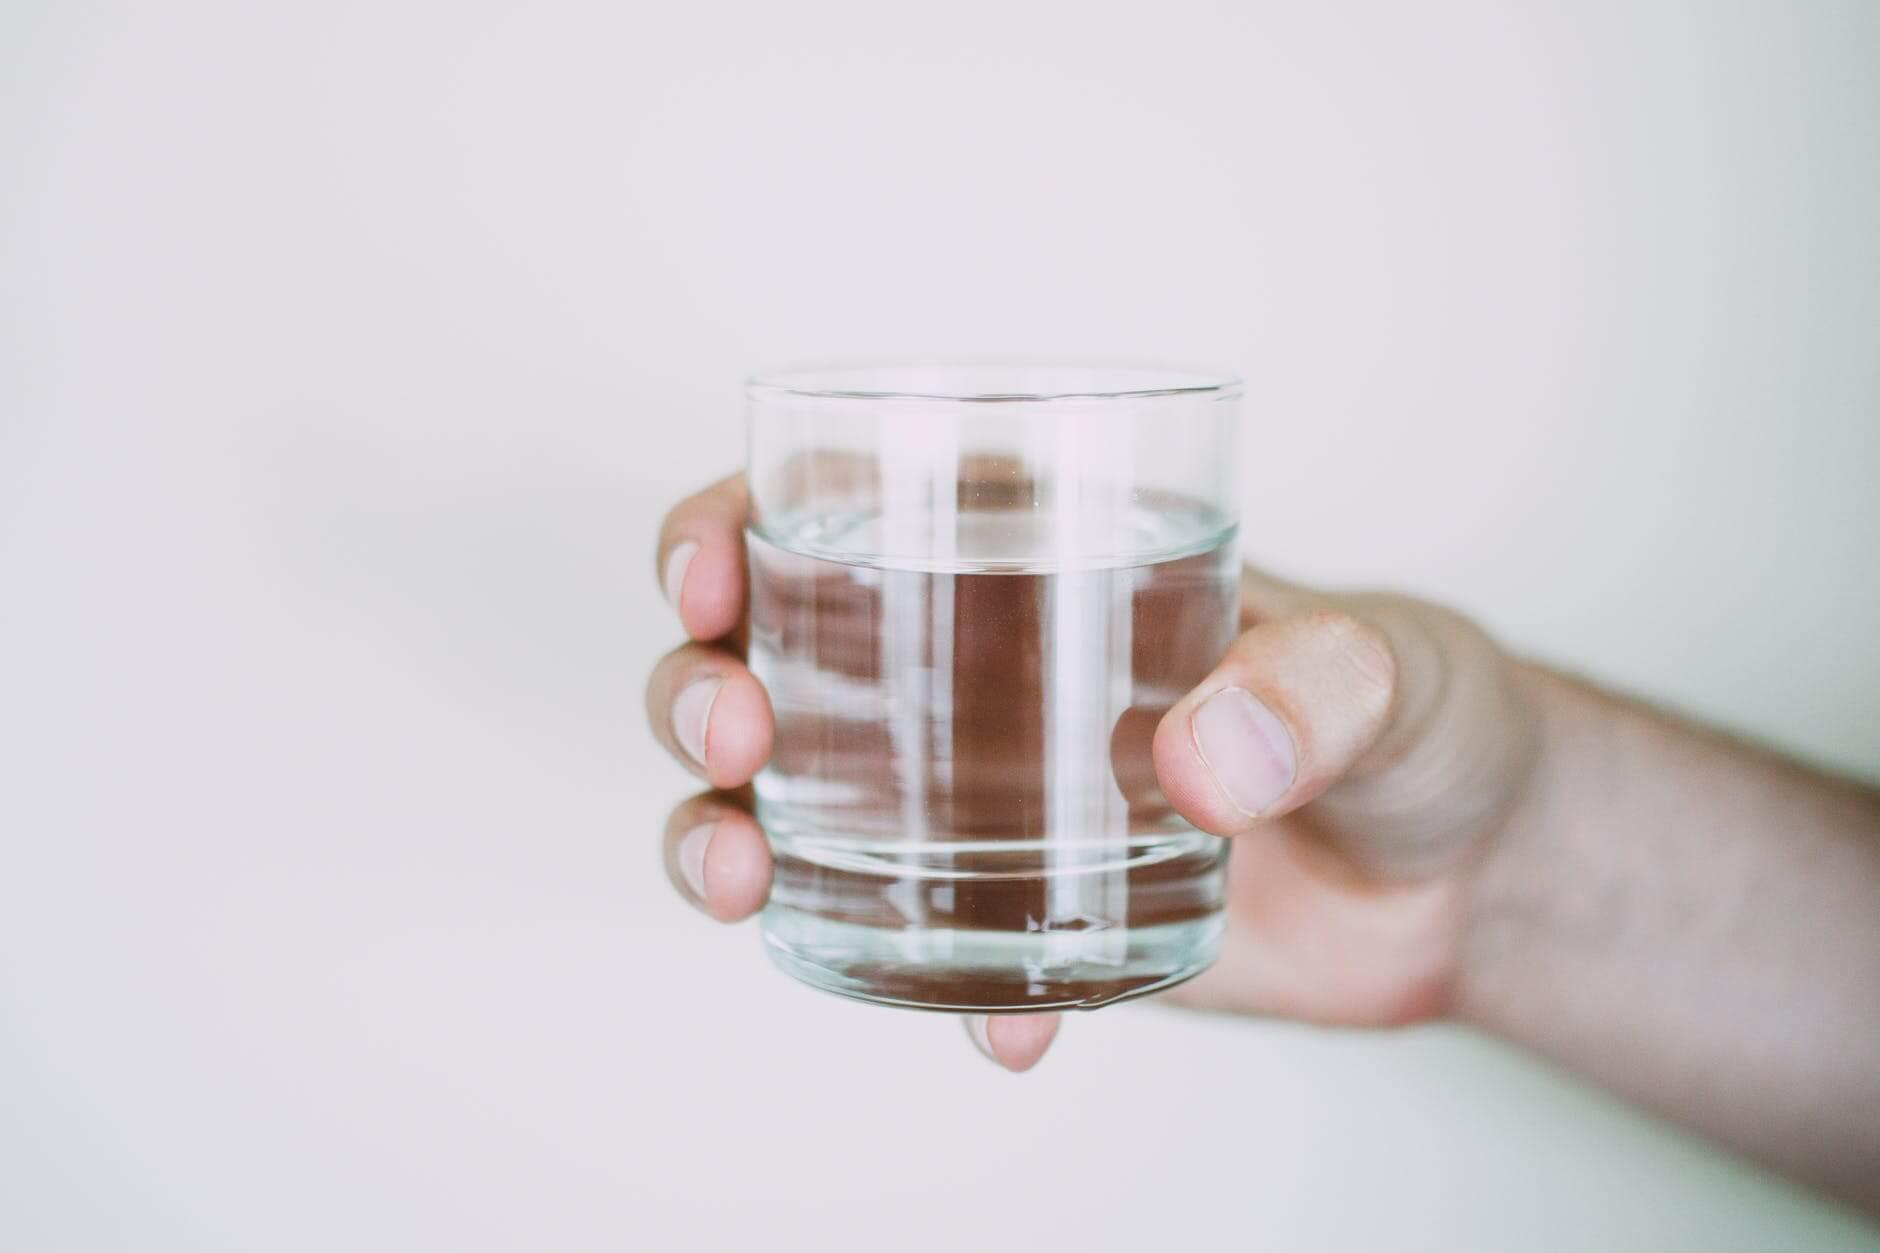 Distilled water in glass